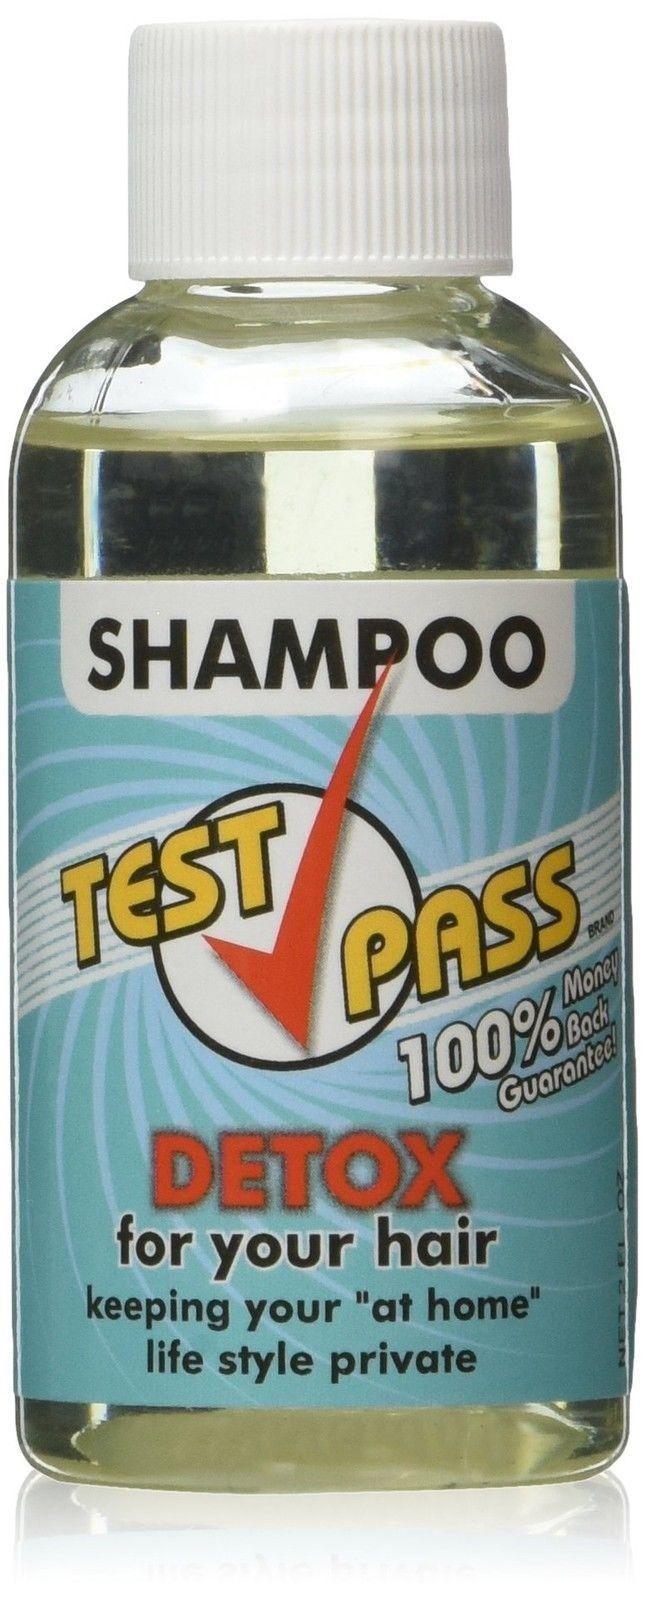 Test Pass Detox Shampoo - Single Use NET 2 FL. OZ.